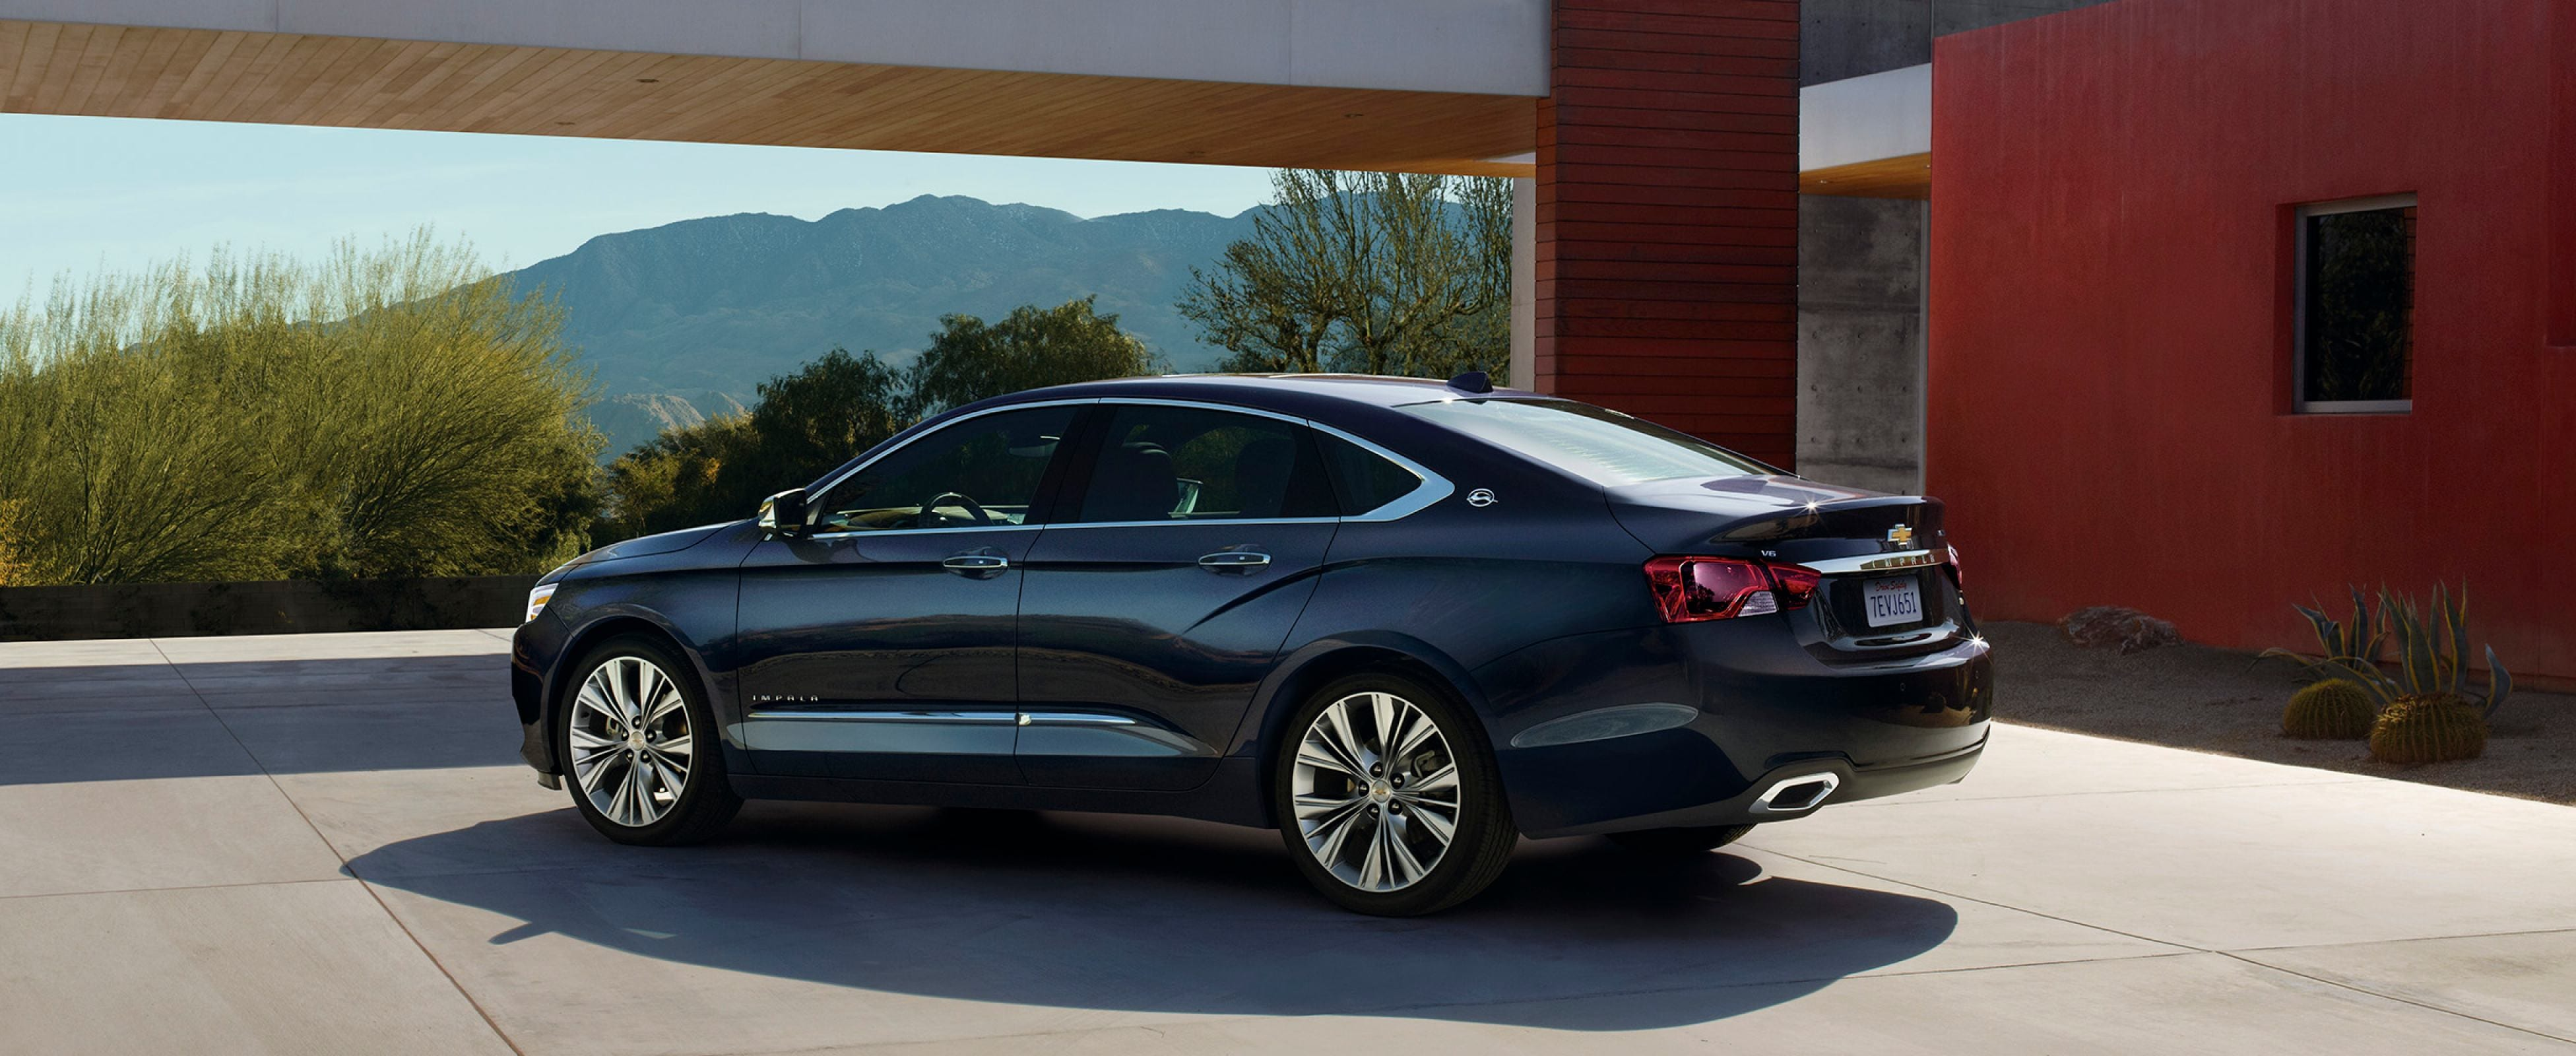 Premium Car Rental [Chevy Impala LT or Similar] | Budget Rent a Car